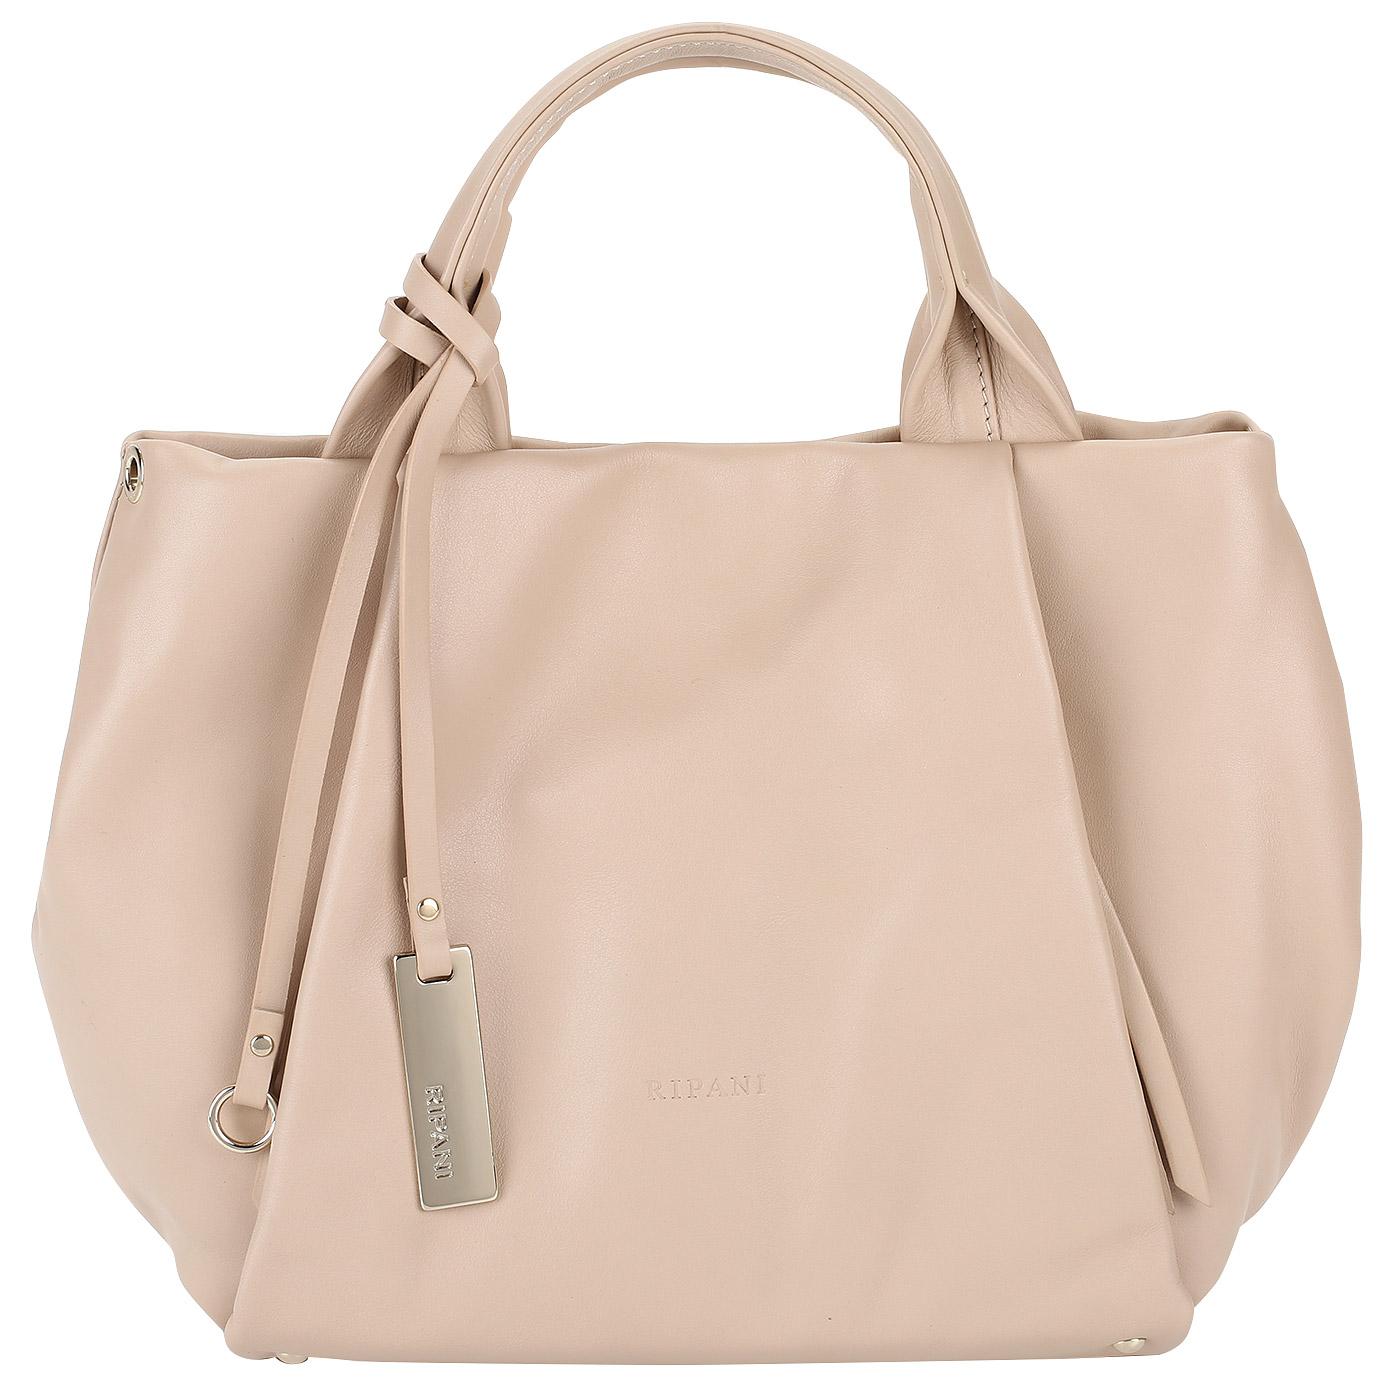 29e40691de6e Женская сумка из бежевой мягкой кожи Ripani Lime 7835LL.00006 ...